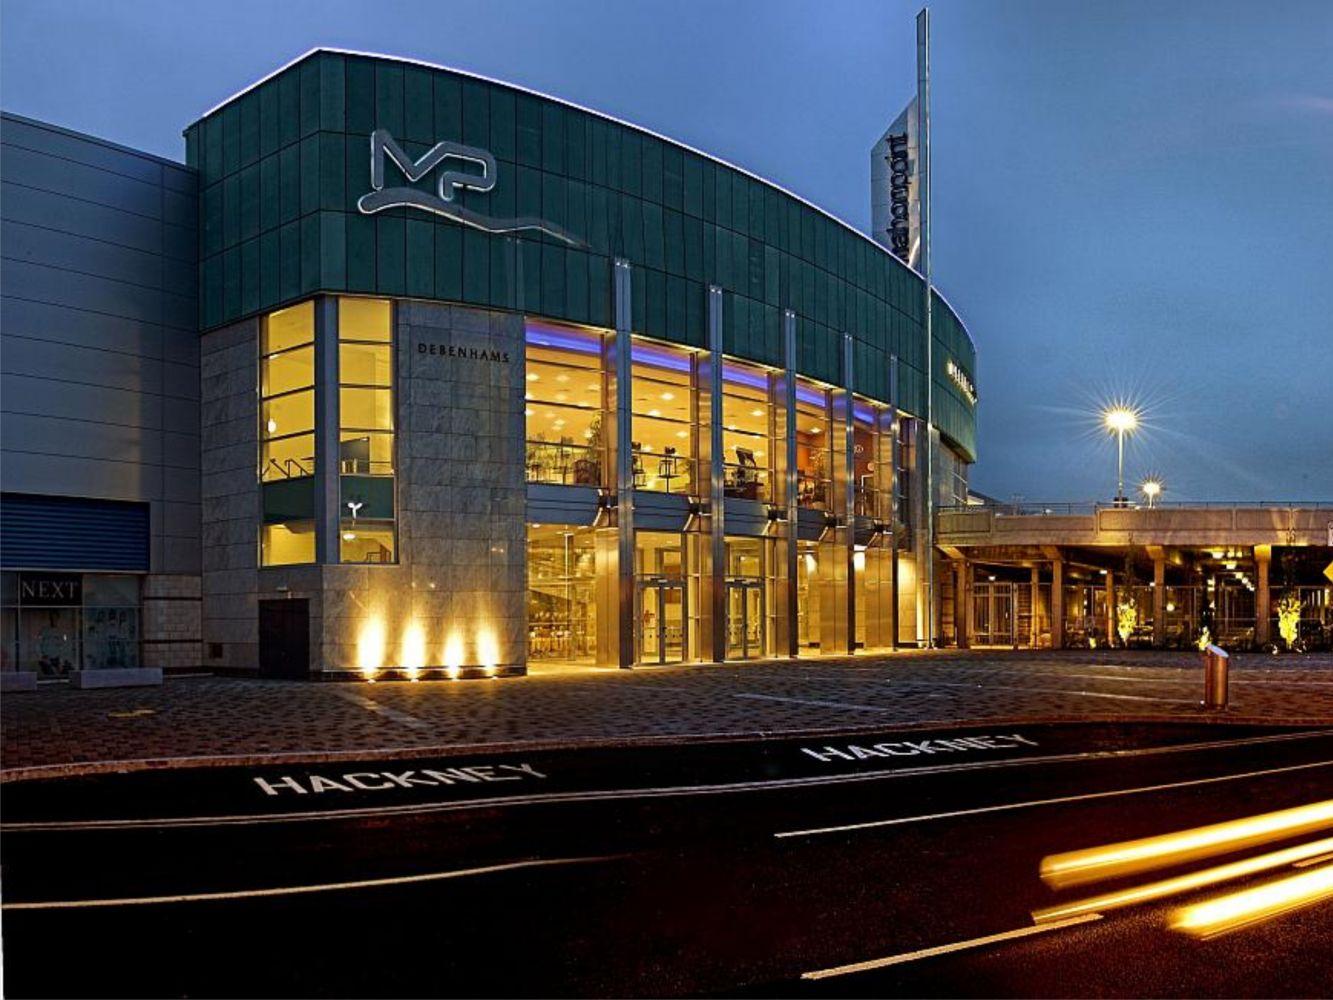 Mahon Cinema